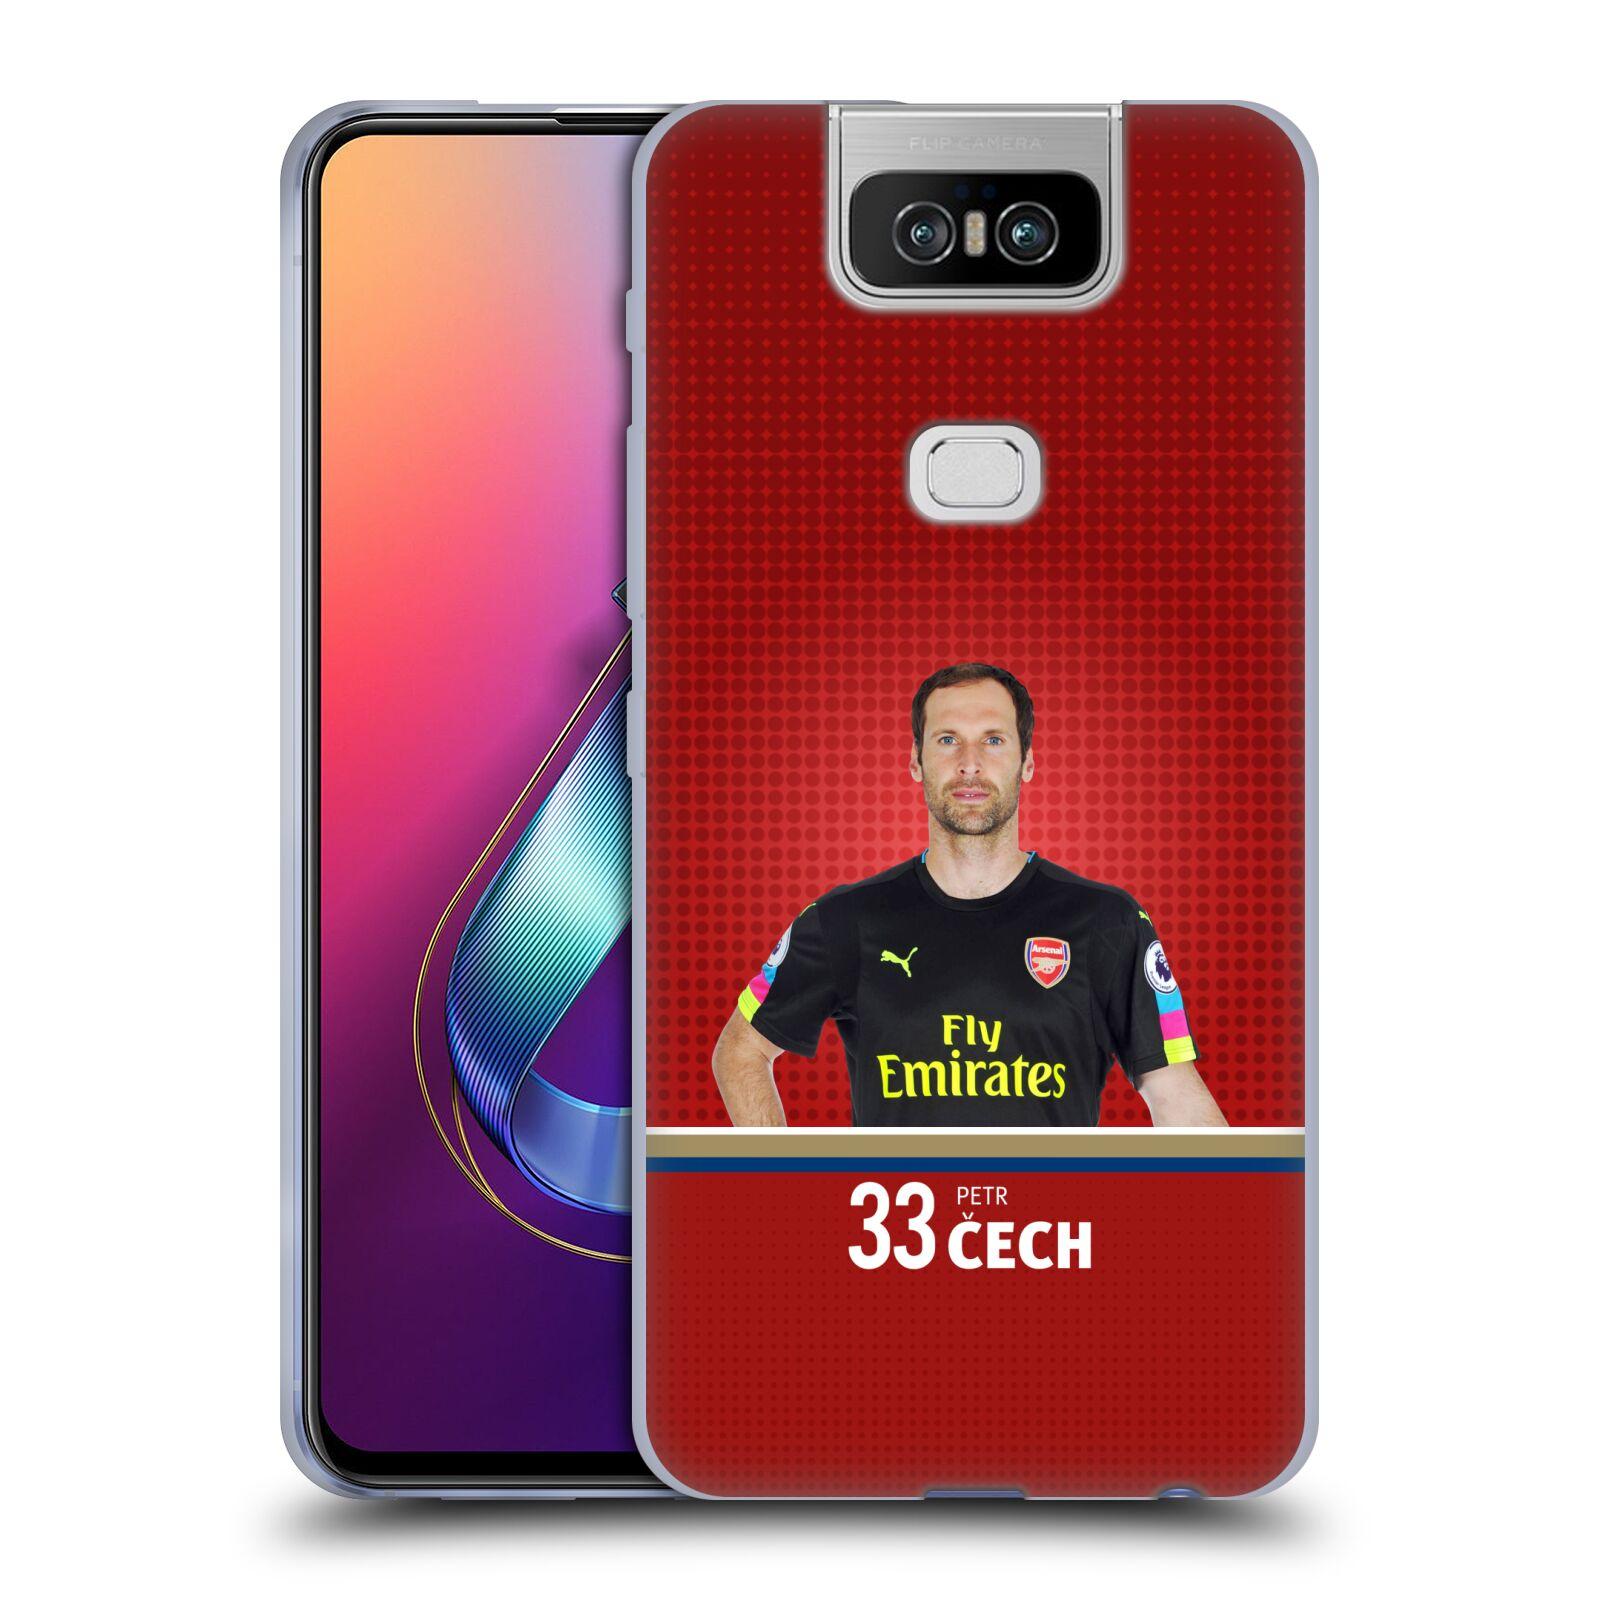 Silikonové pouzdro na mobil Asus Zenfone 6 ZS630KL - Head Case - Arsenal FC - Petr Čech